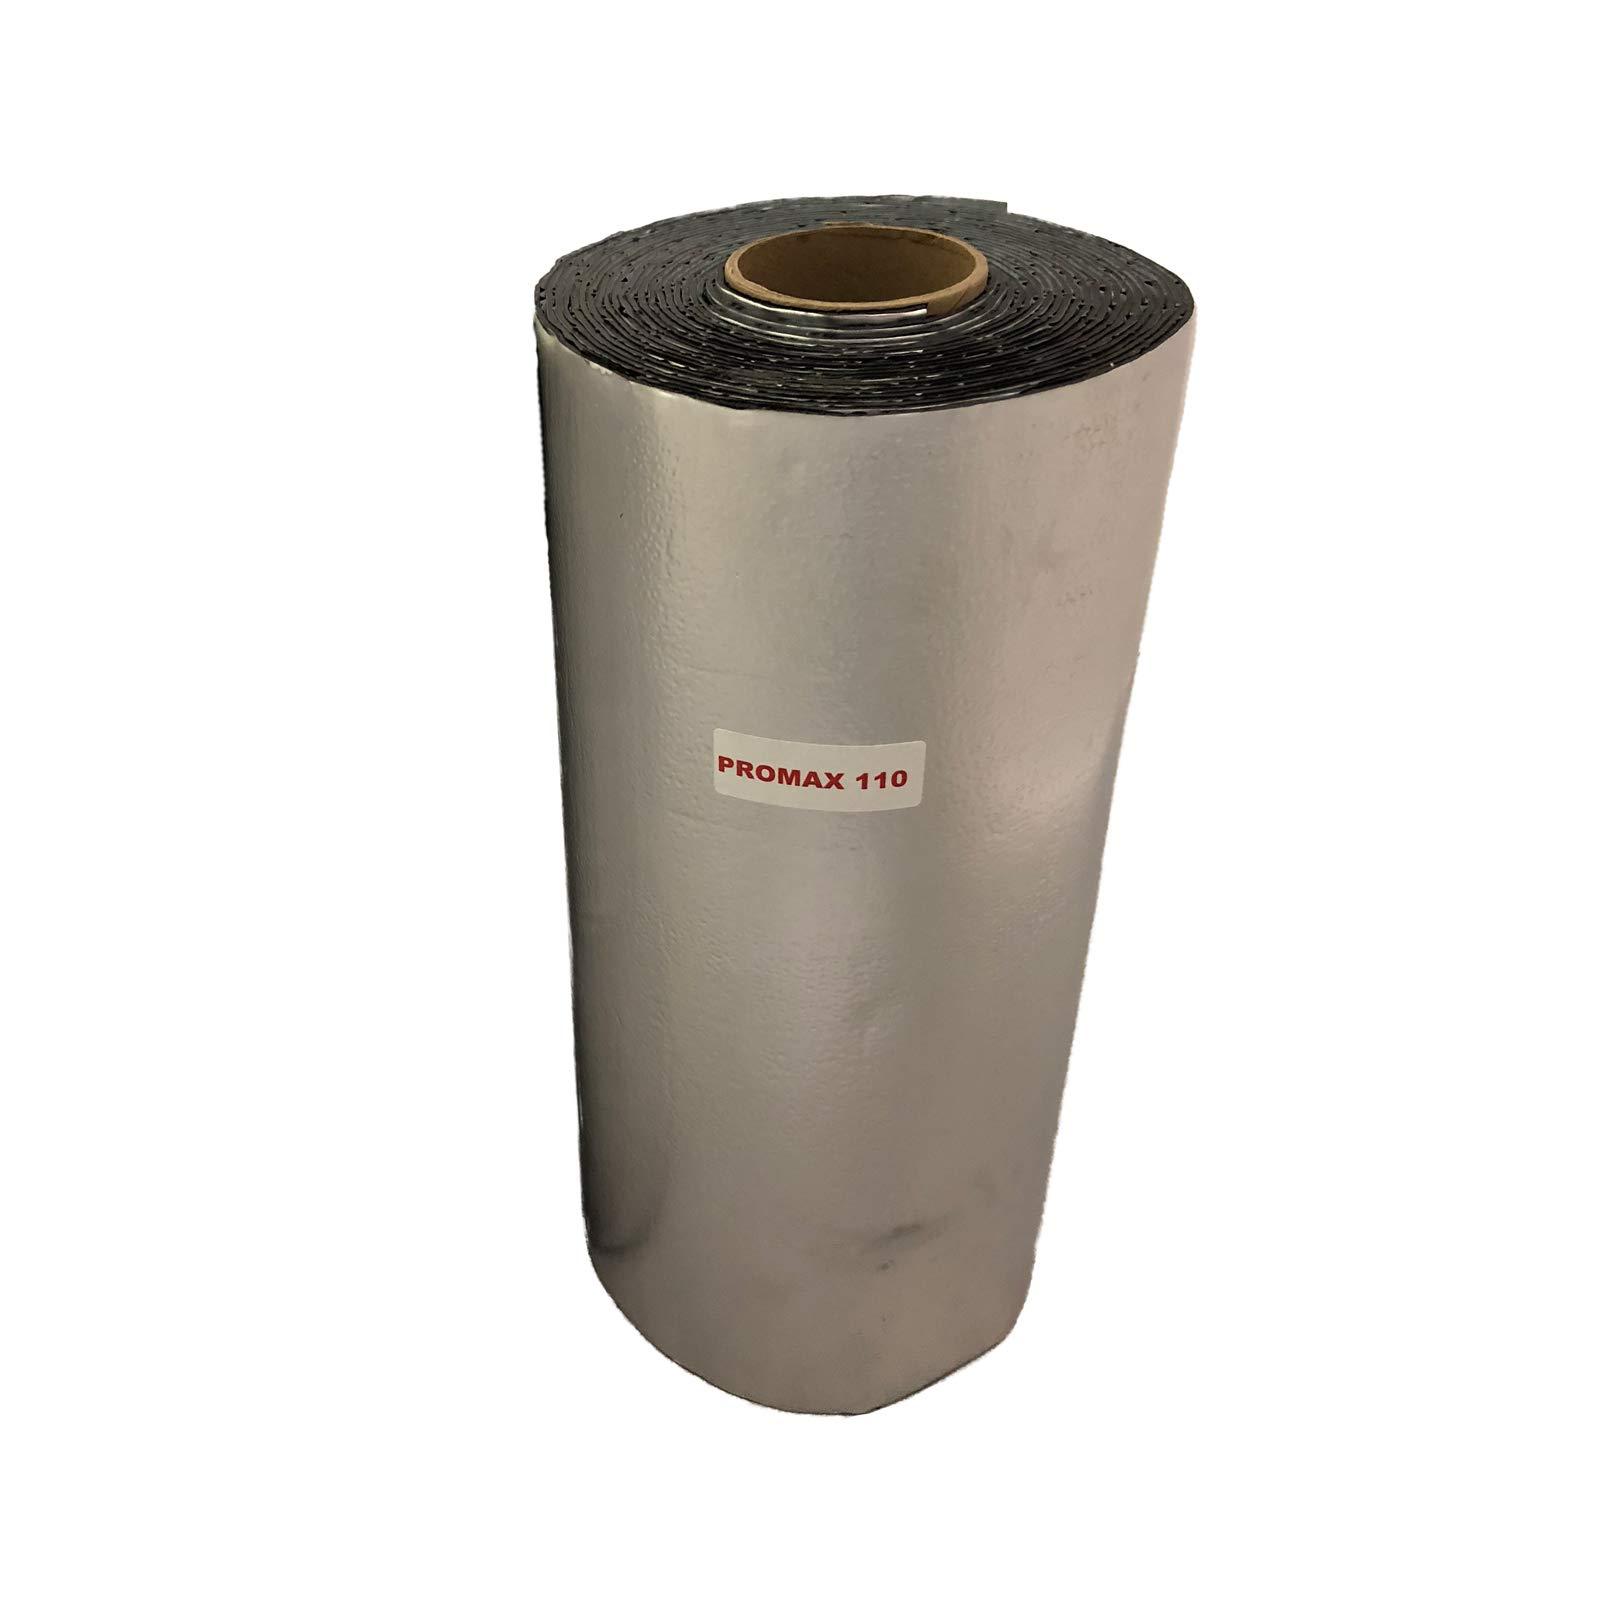 FatMat ProMax 110mil Self-Adhesive Sound Deadener with Install Kit (75 Sq Ft)